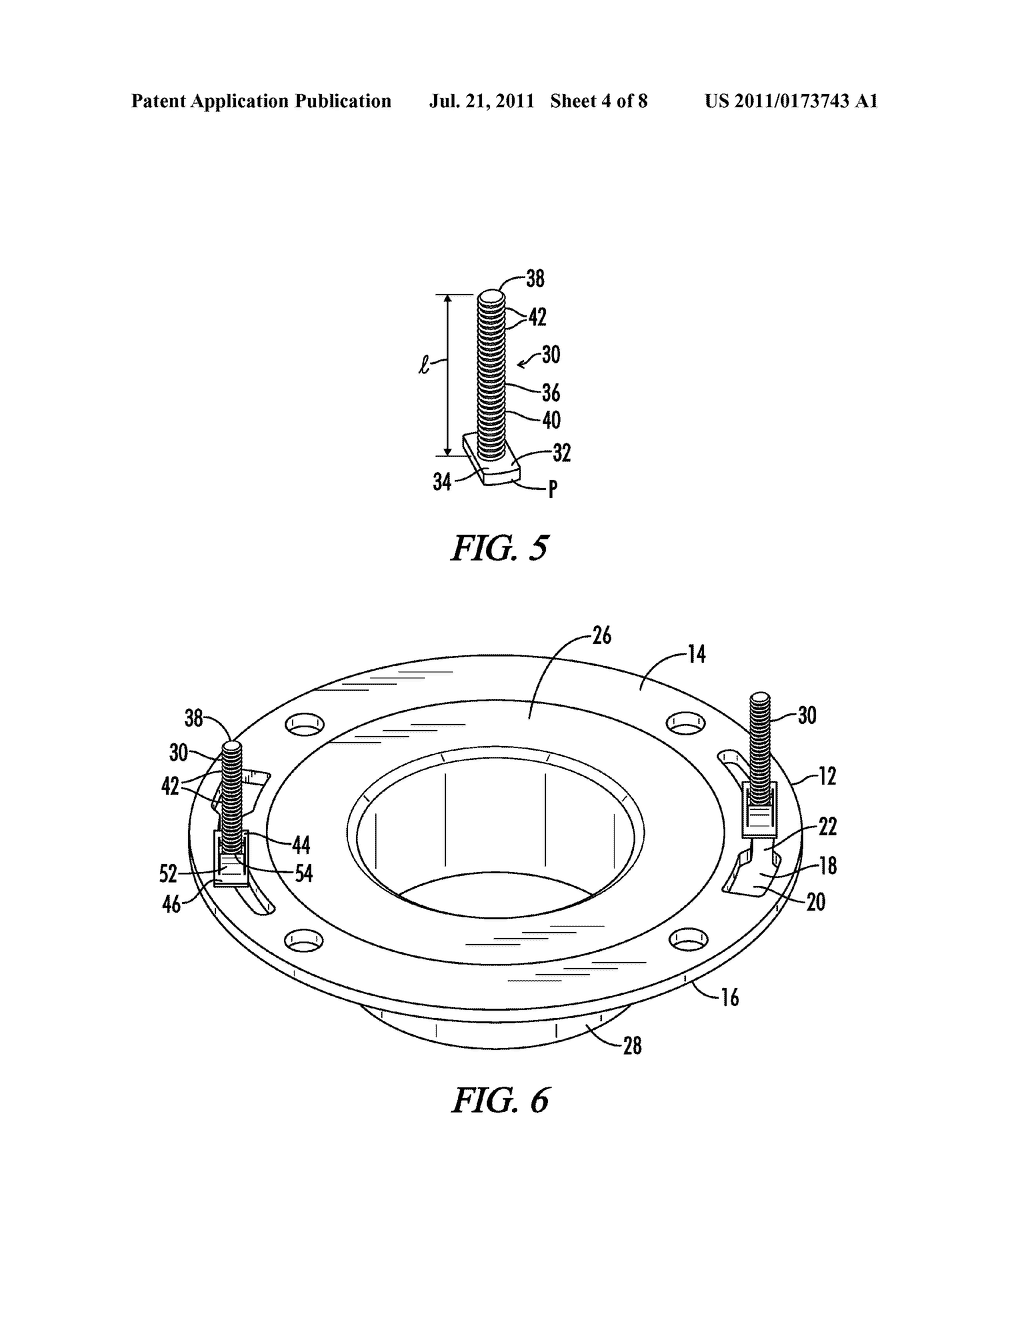 toilet schematic diagram motorguide trolling motor parts of a specifications elsavadorla